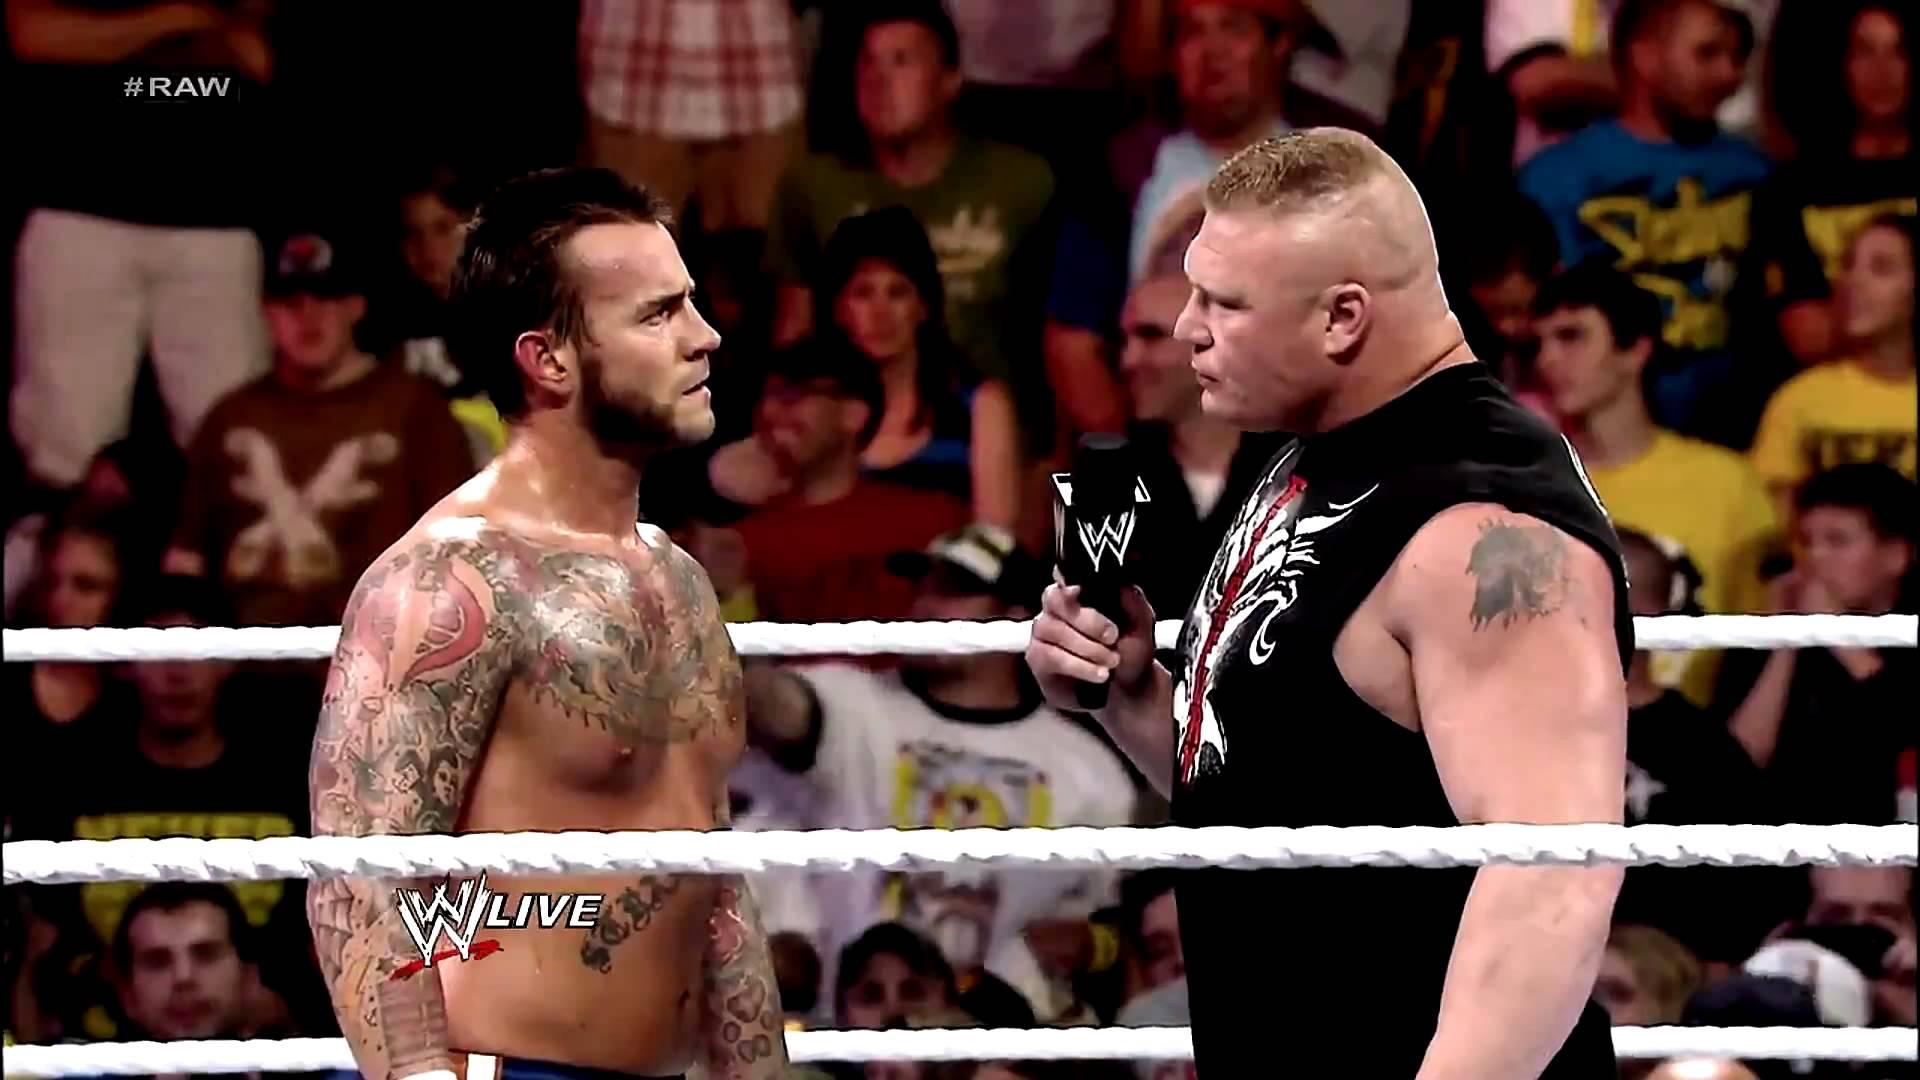 CM Punk vs Brock Lesnar – An All Time Classic